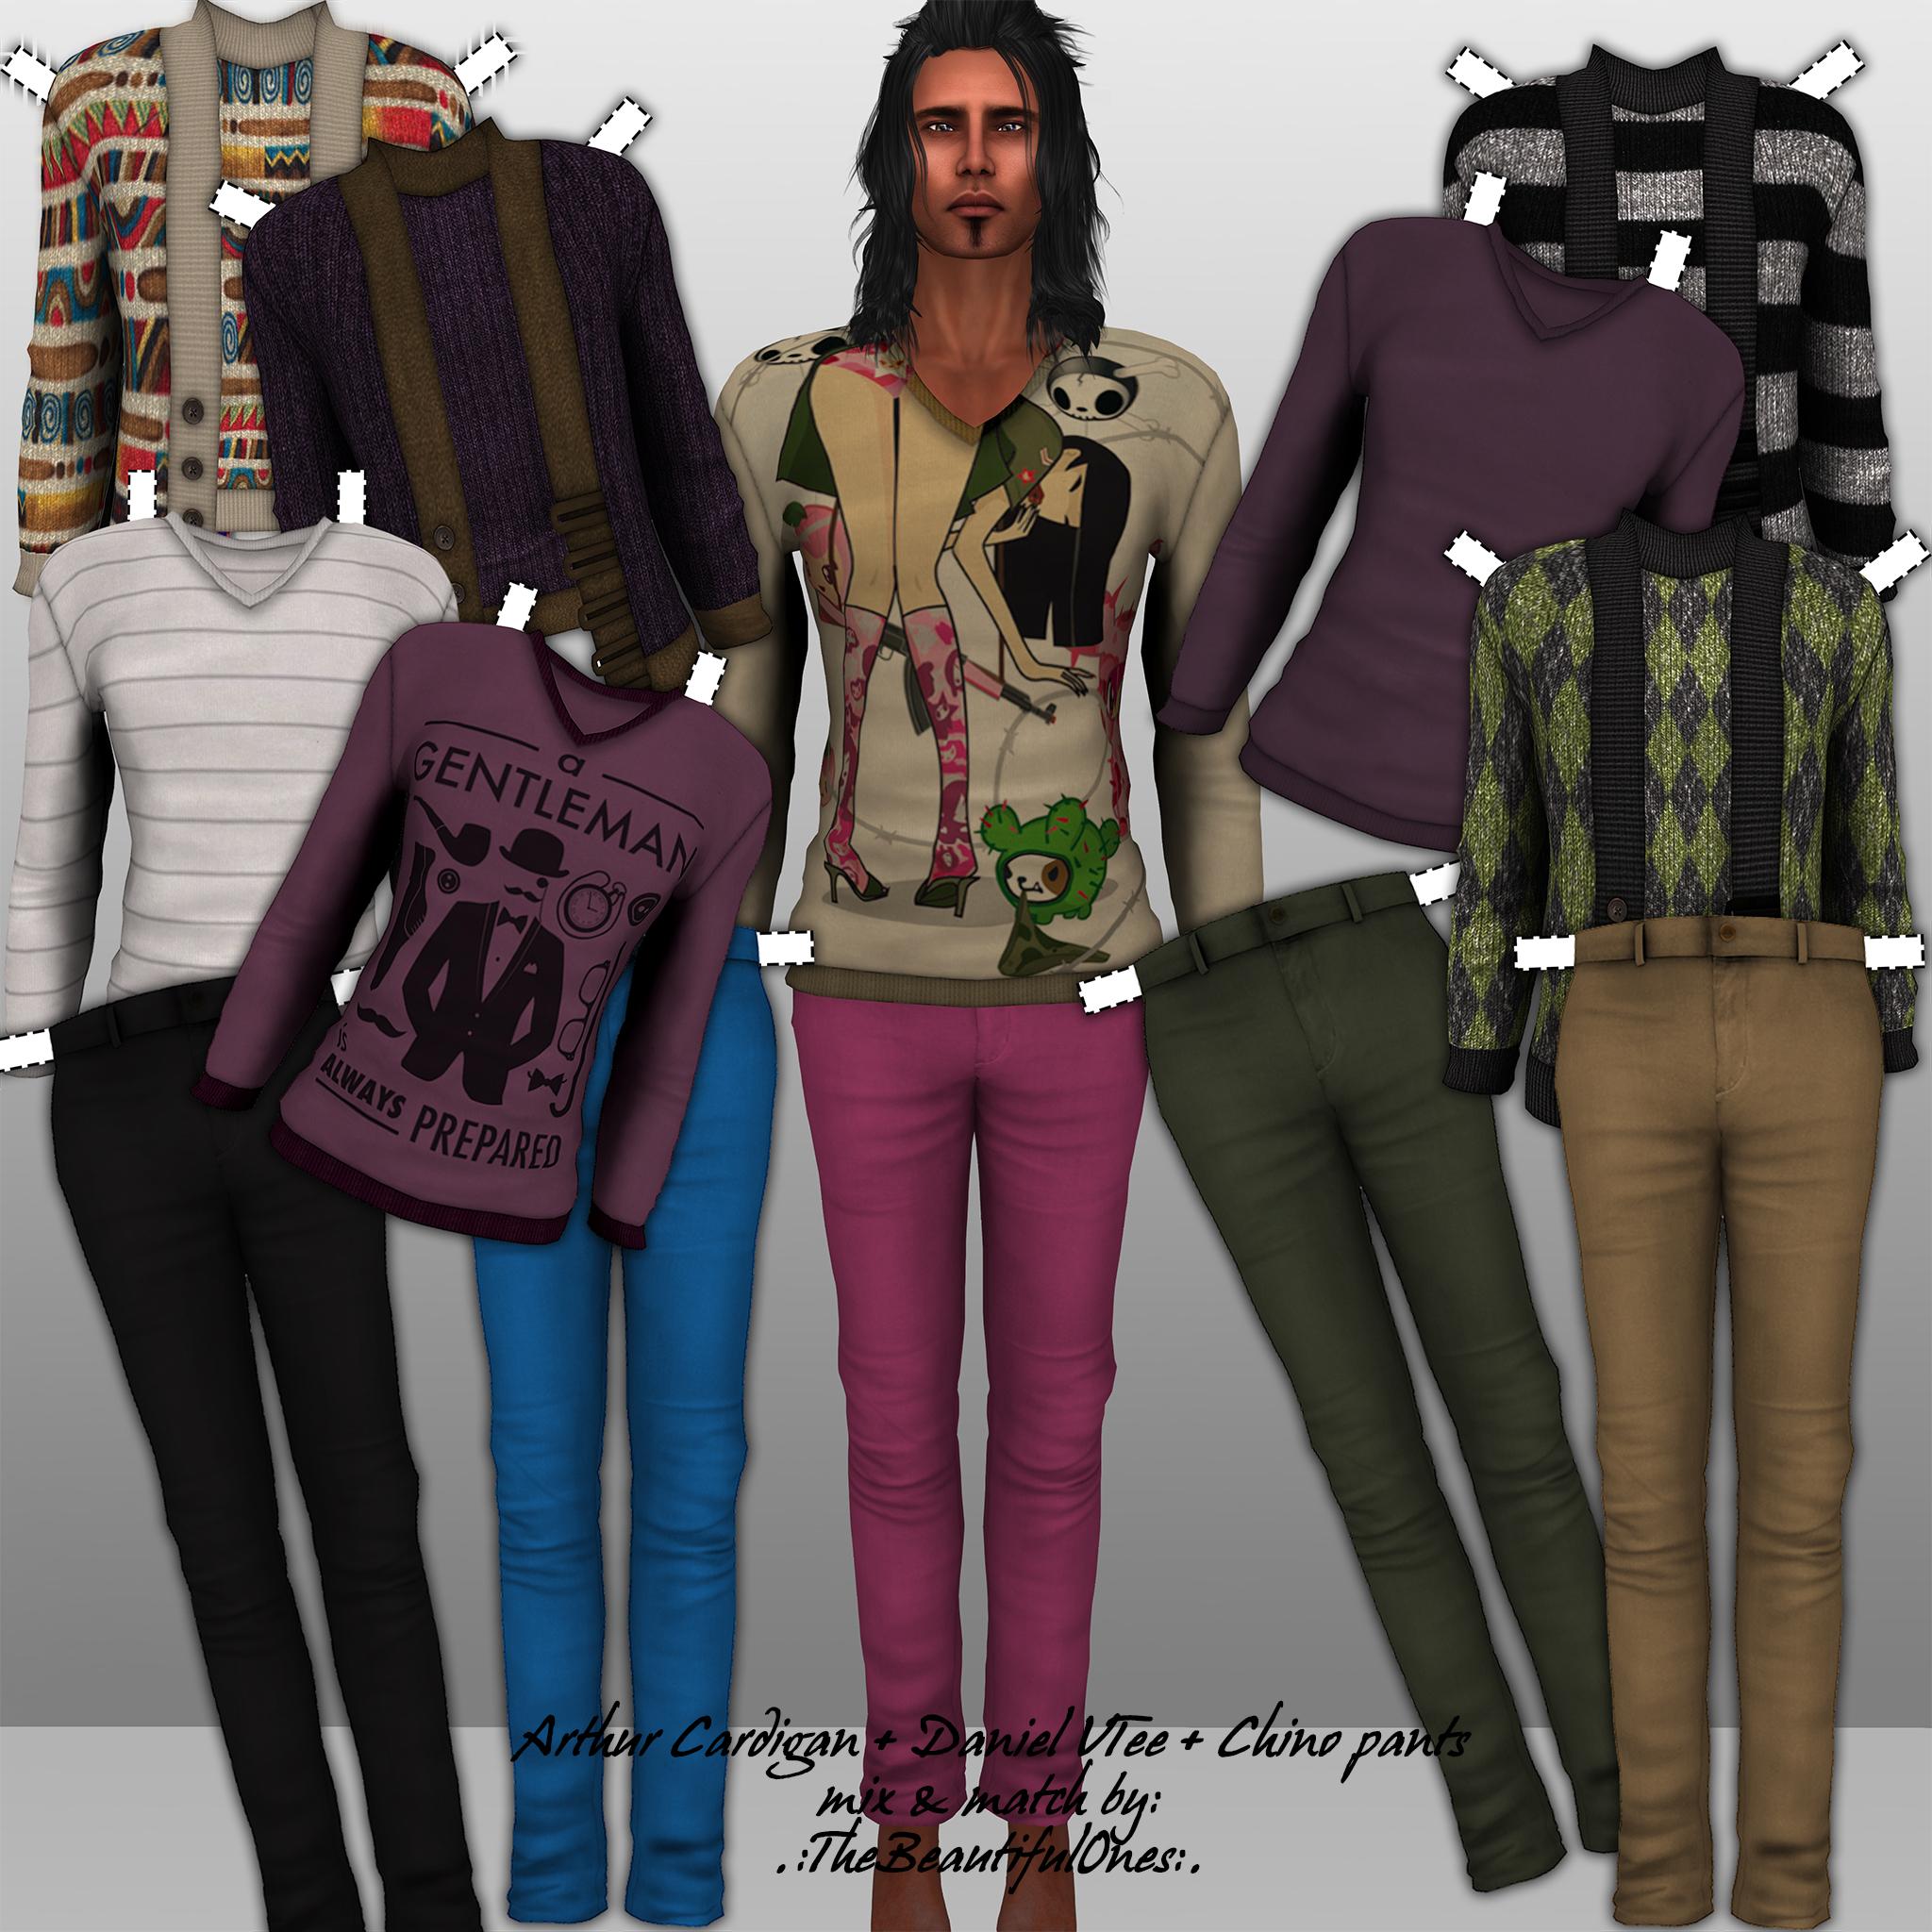 Mix & match clothing store